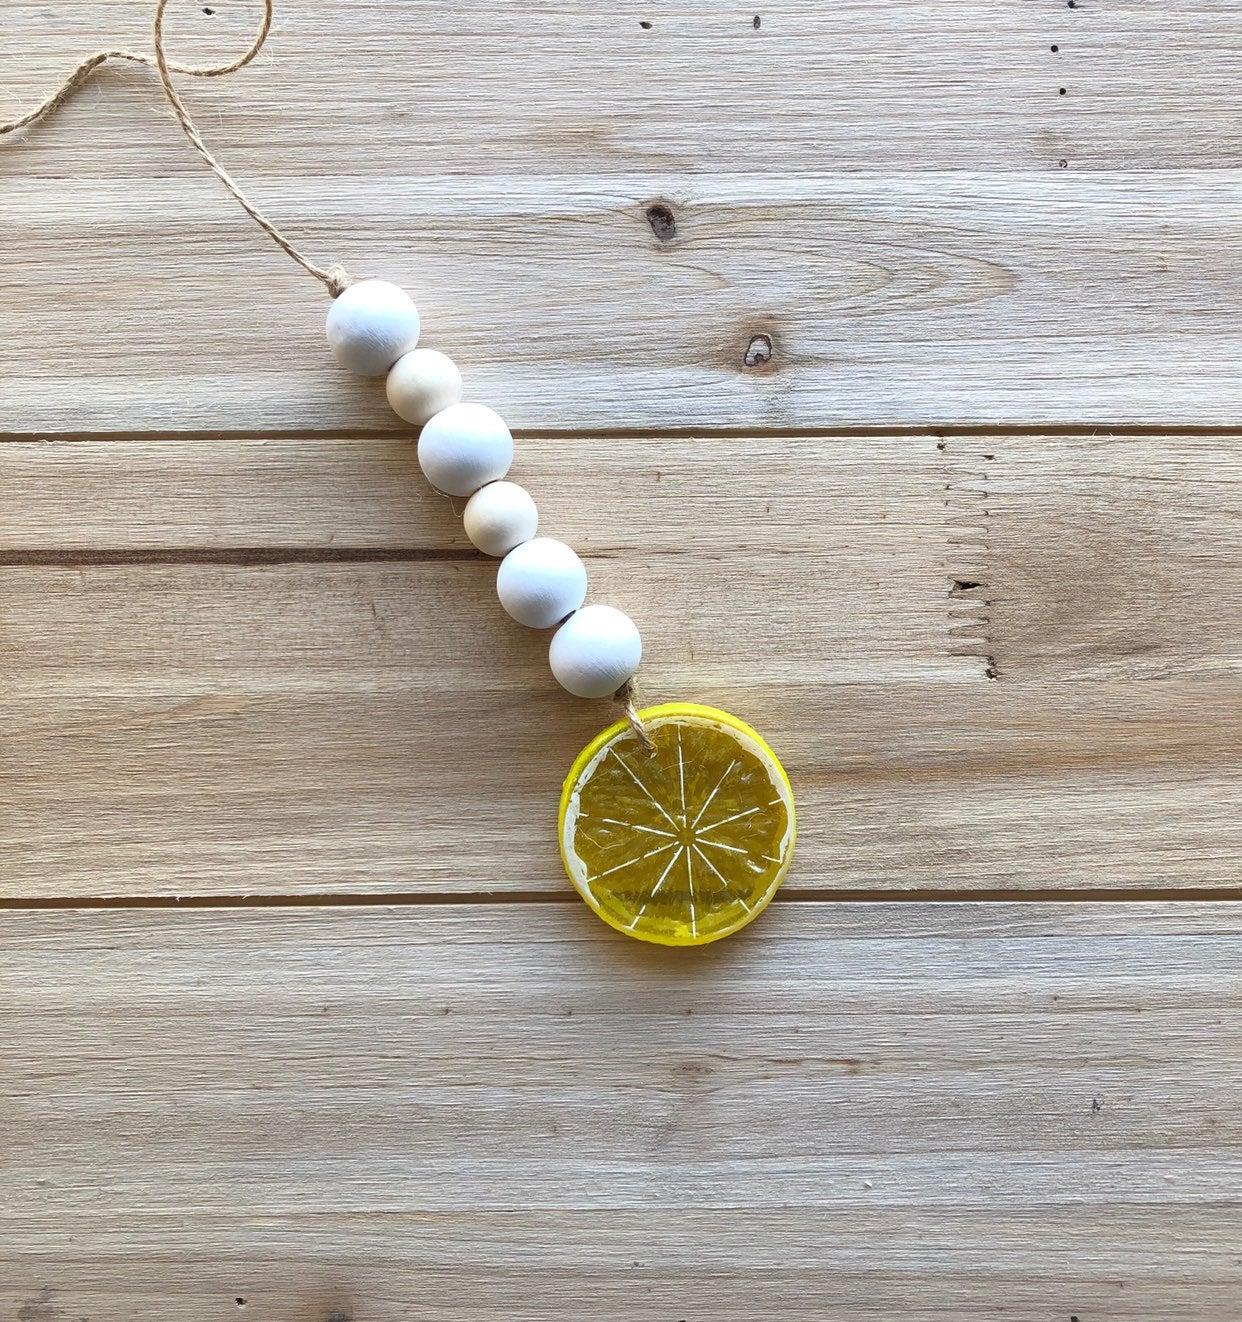 Mini Lemon Farmhouse garland